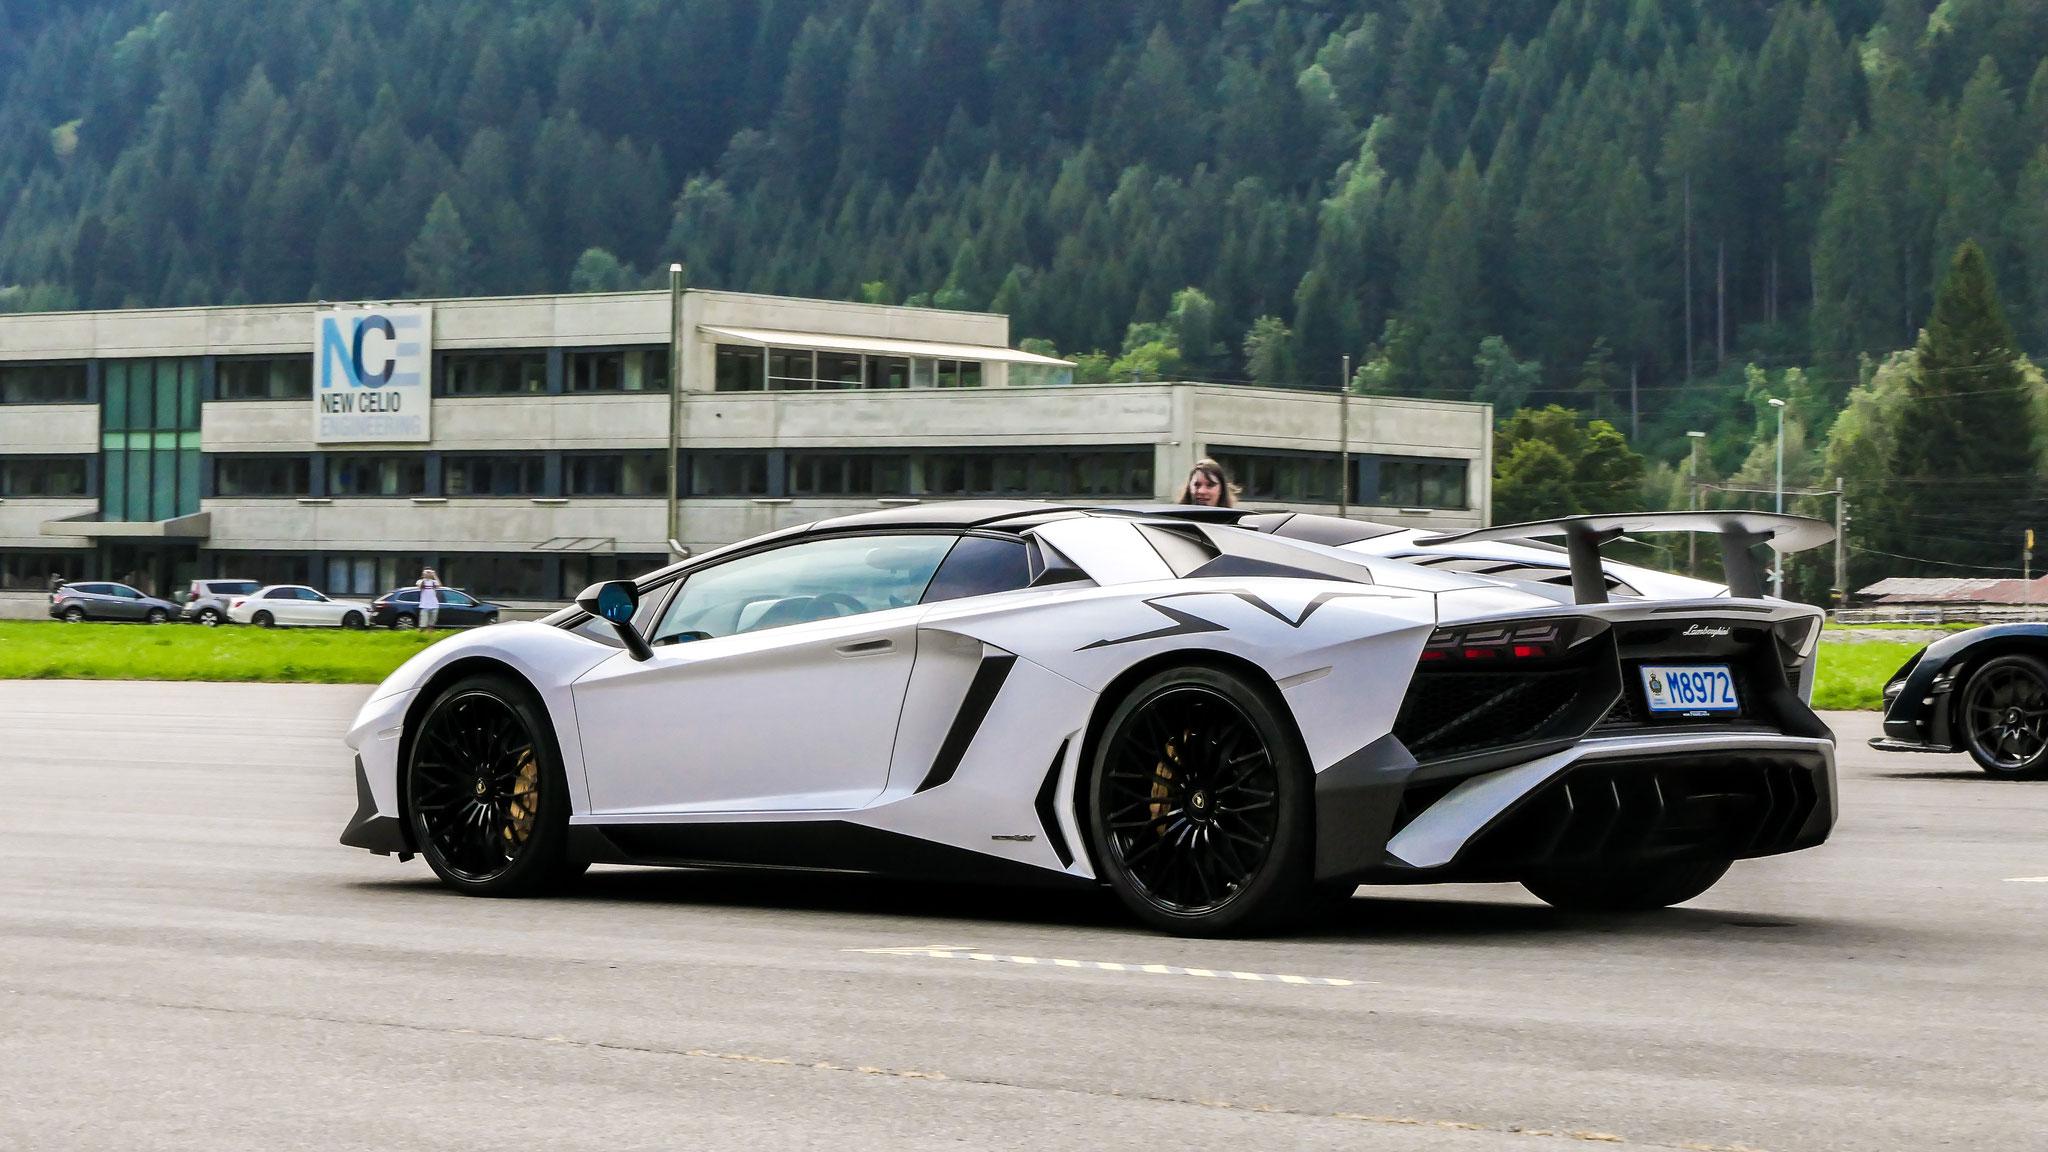 Lamborghini Aventador LP-750-4 SV Roadster - M8972 (AND)